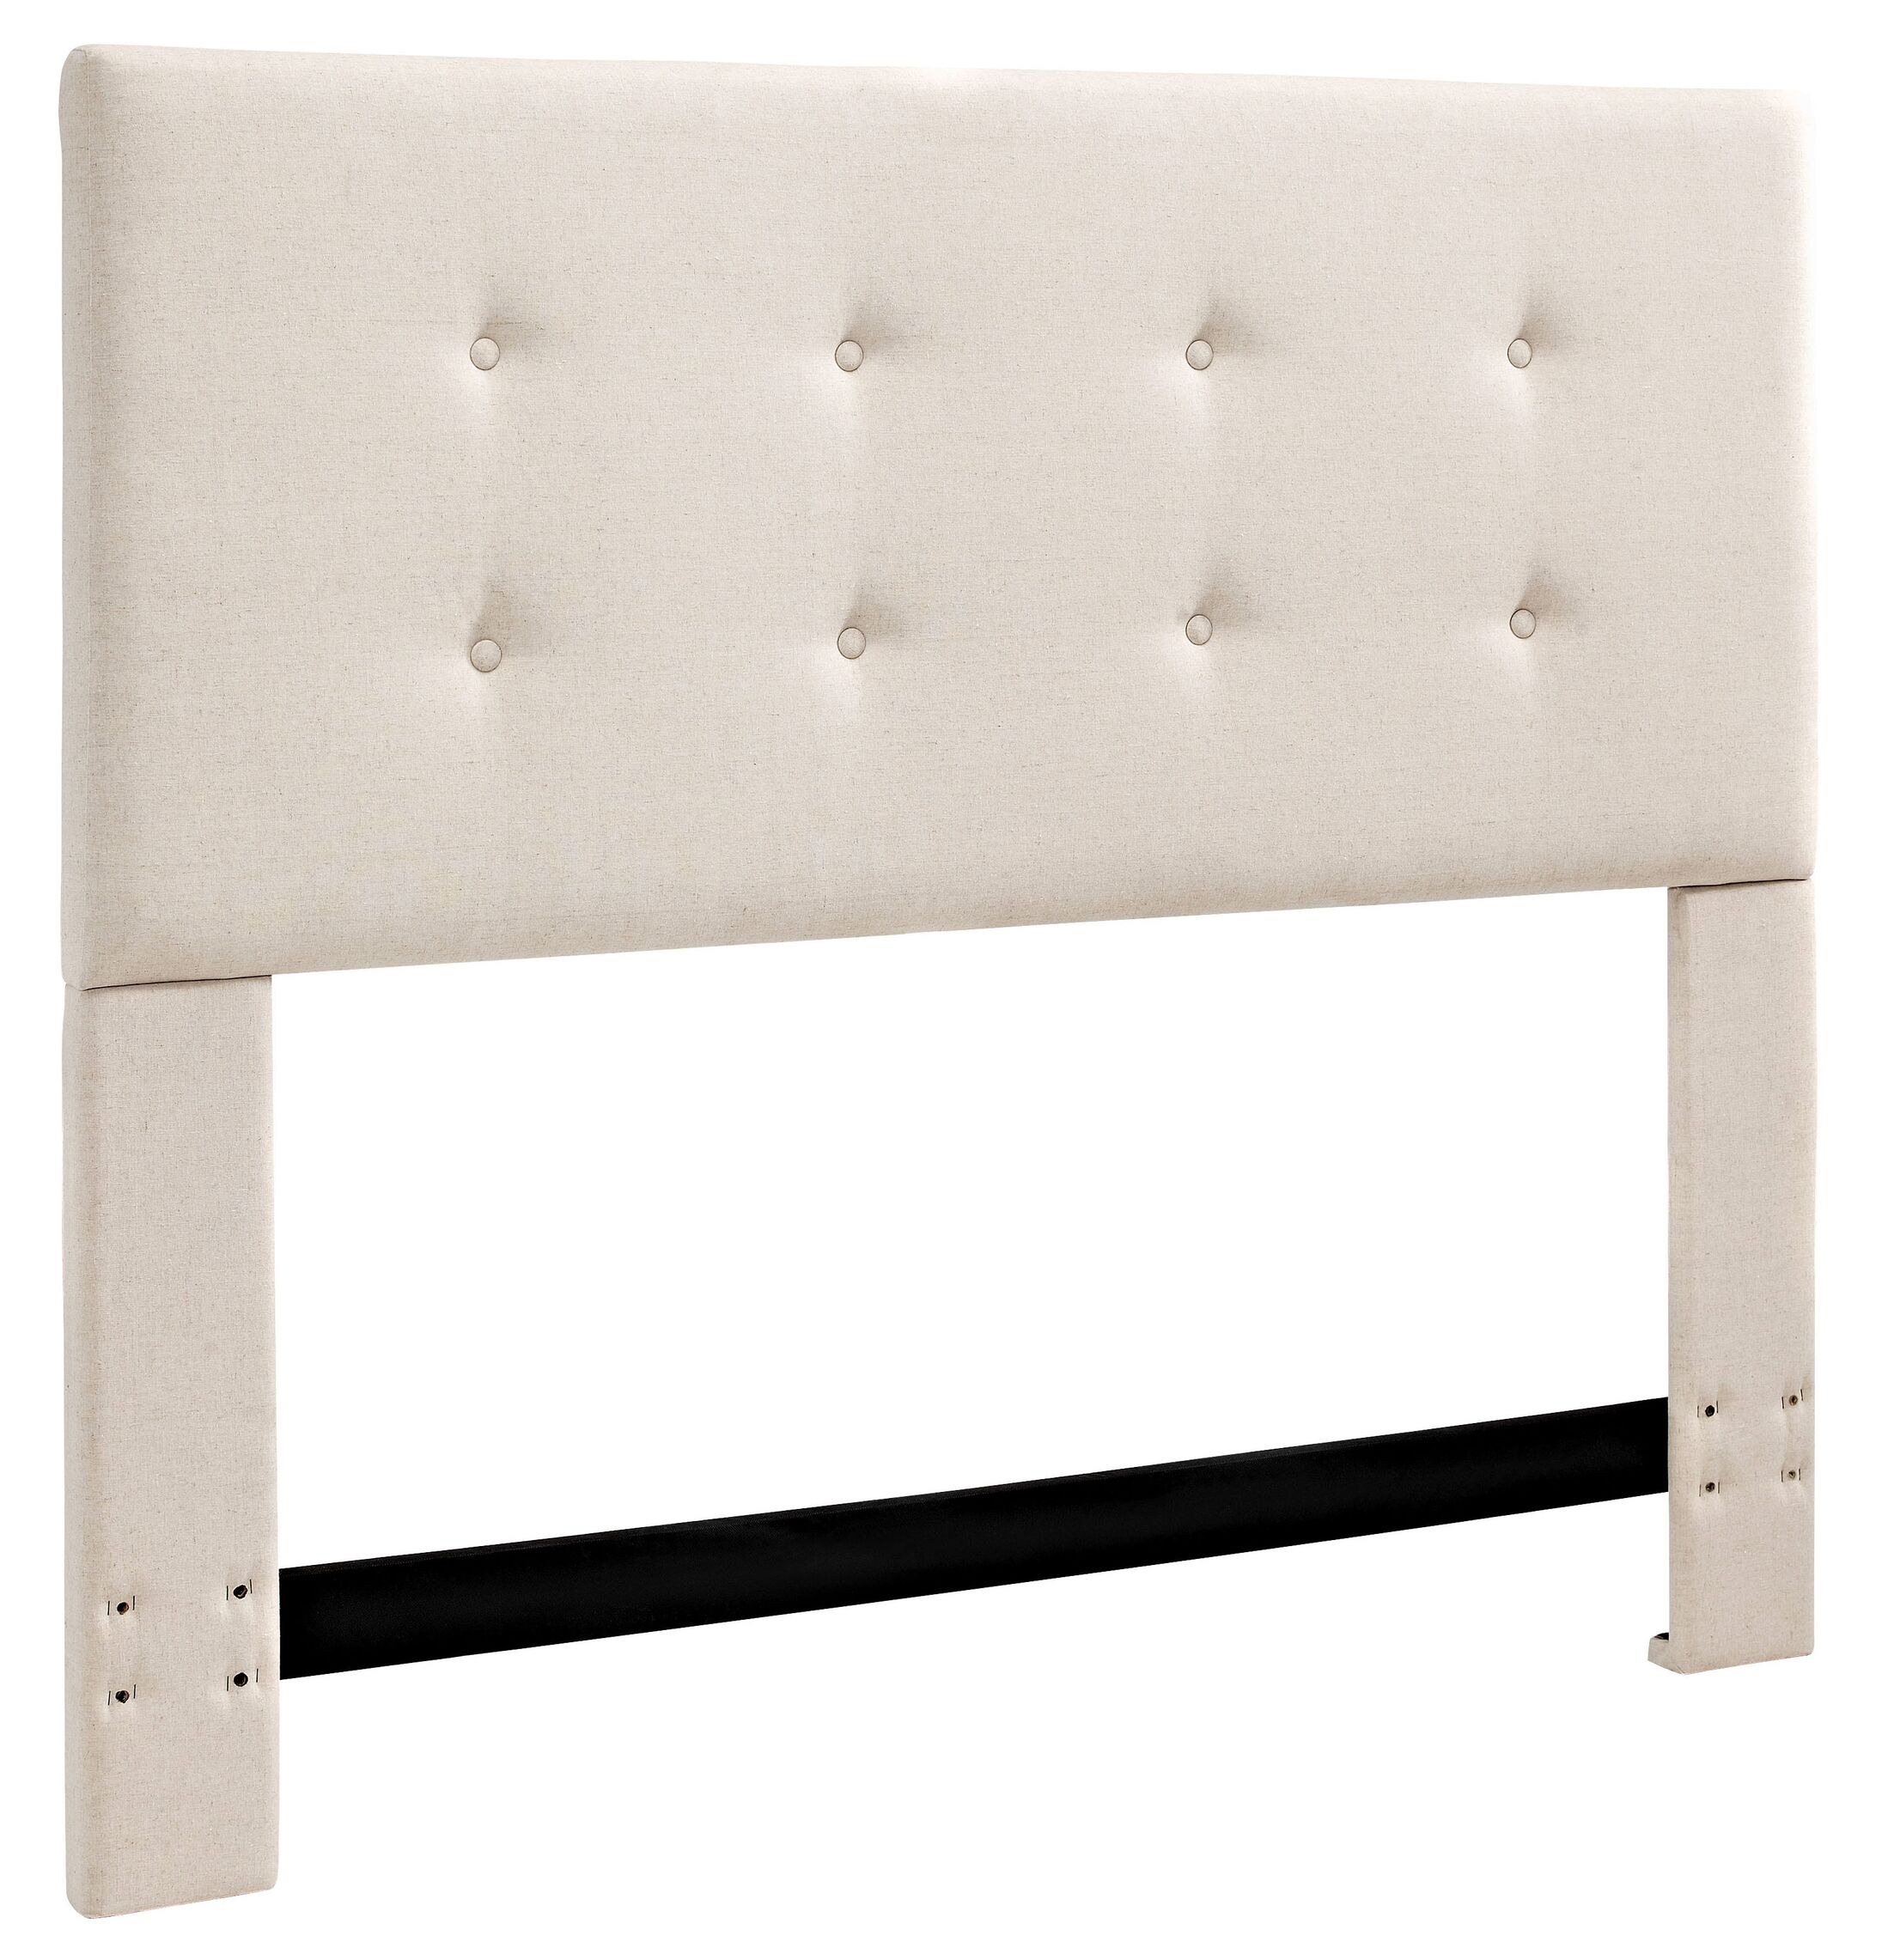 Bates Upholstered Panel Headboard Size: King/California King